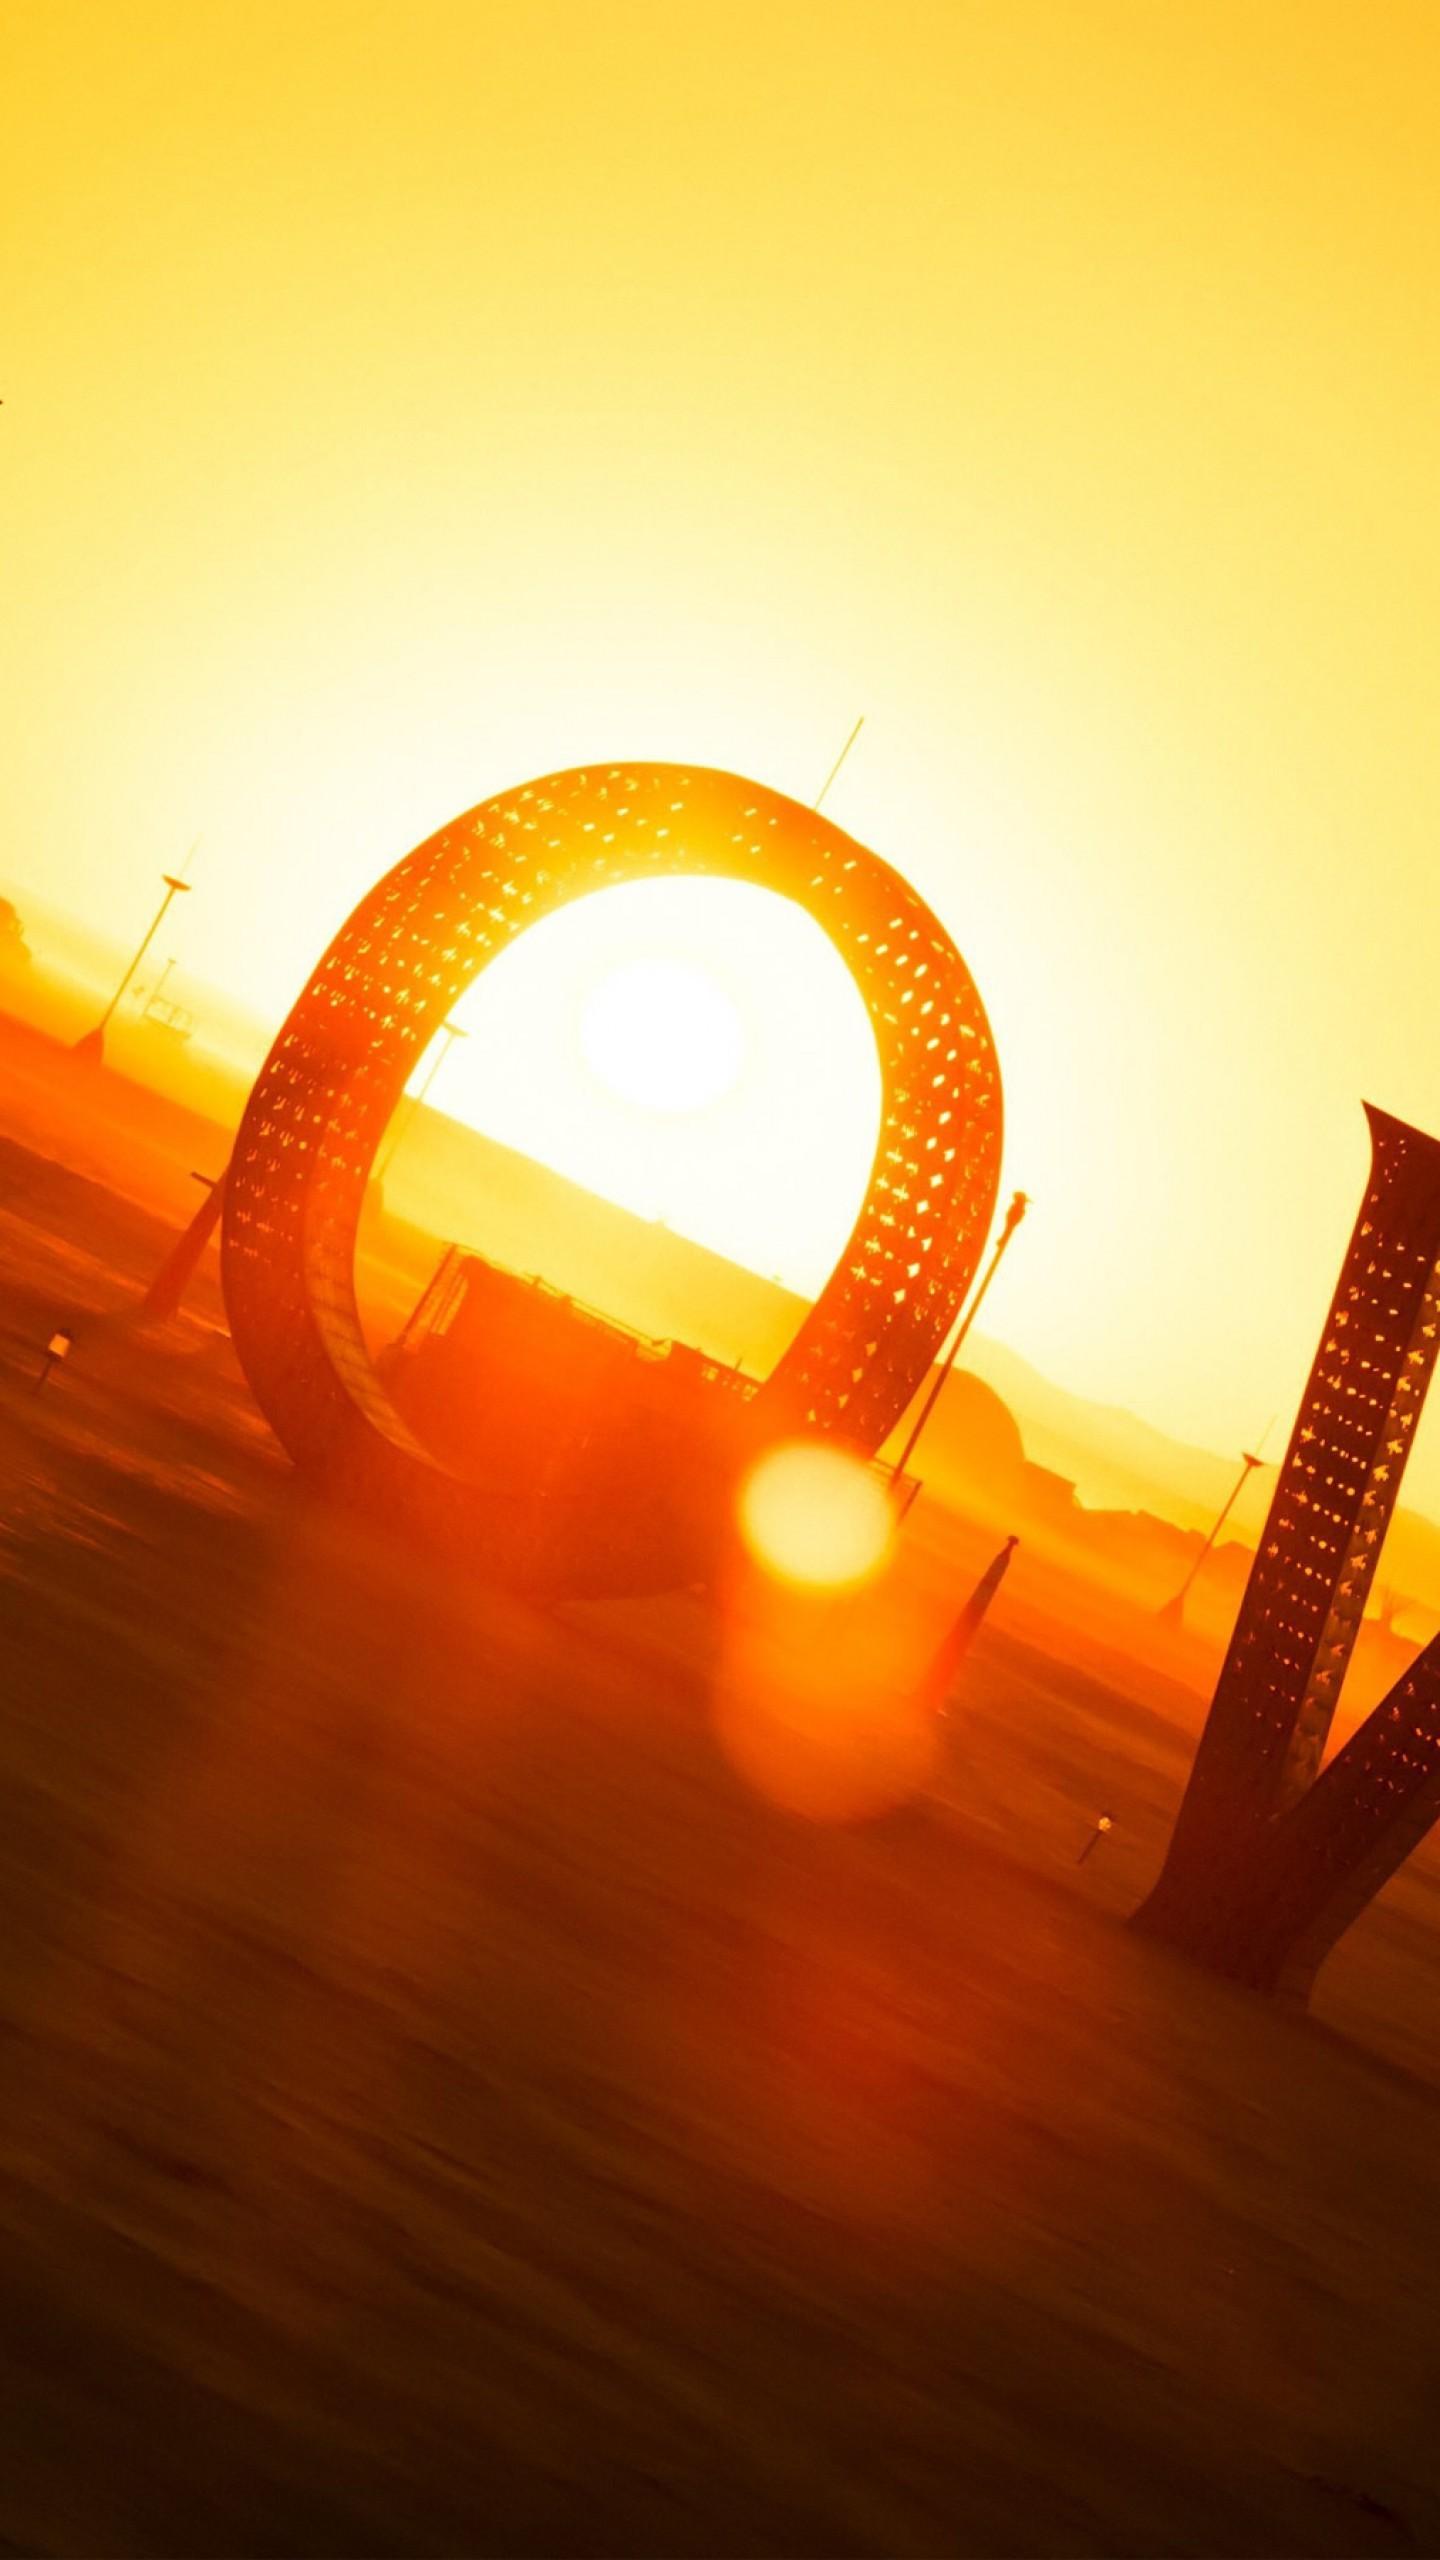 عکس زمینه عشق در غروب آفتاب پس زمینه